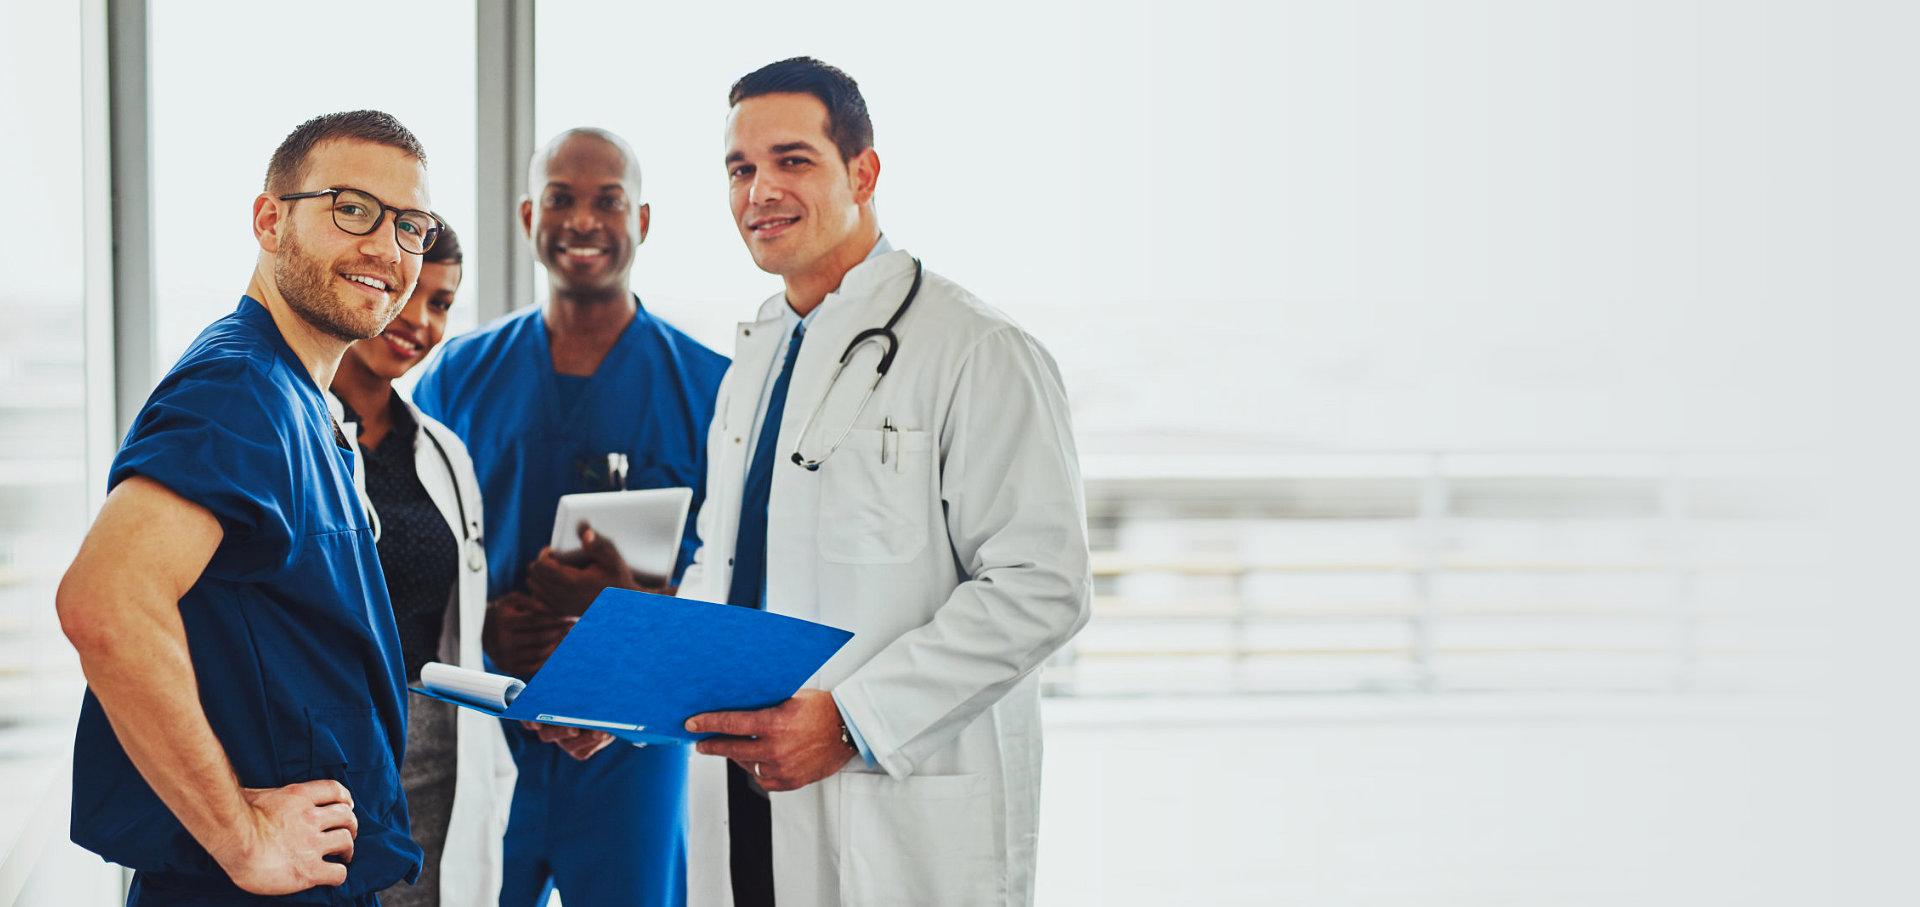 medical staff smiling